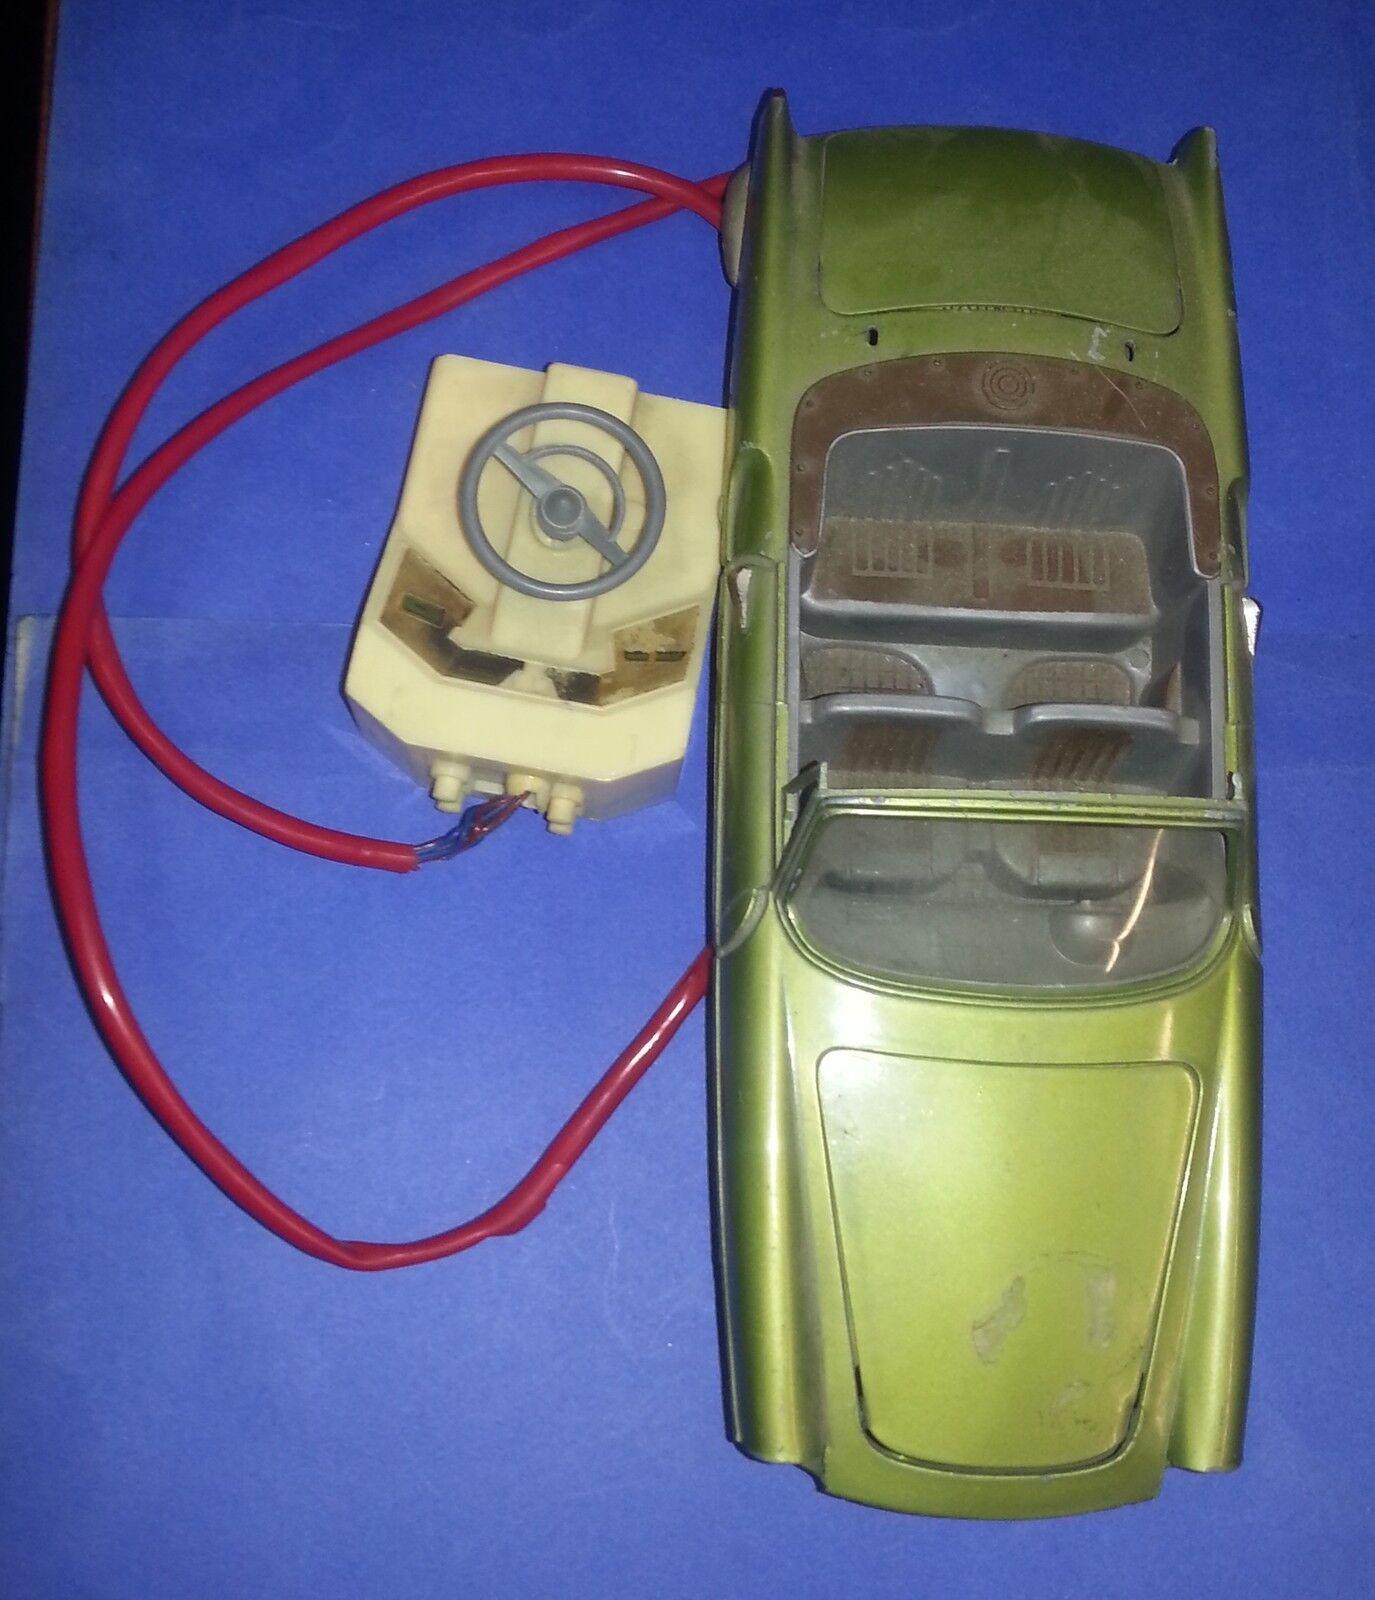 26018 Auto filoguidata France Jouet - Renault Floride - in metallo - cm 28